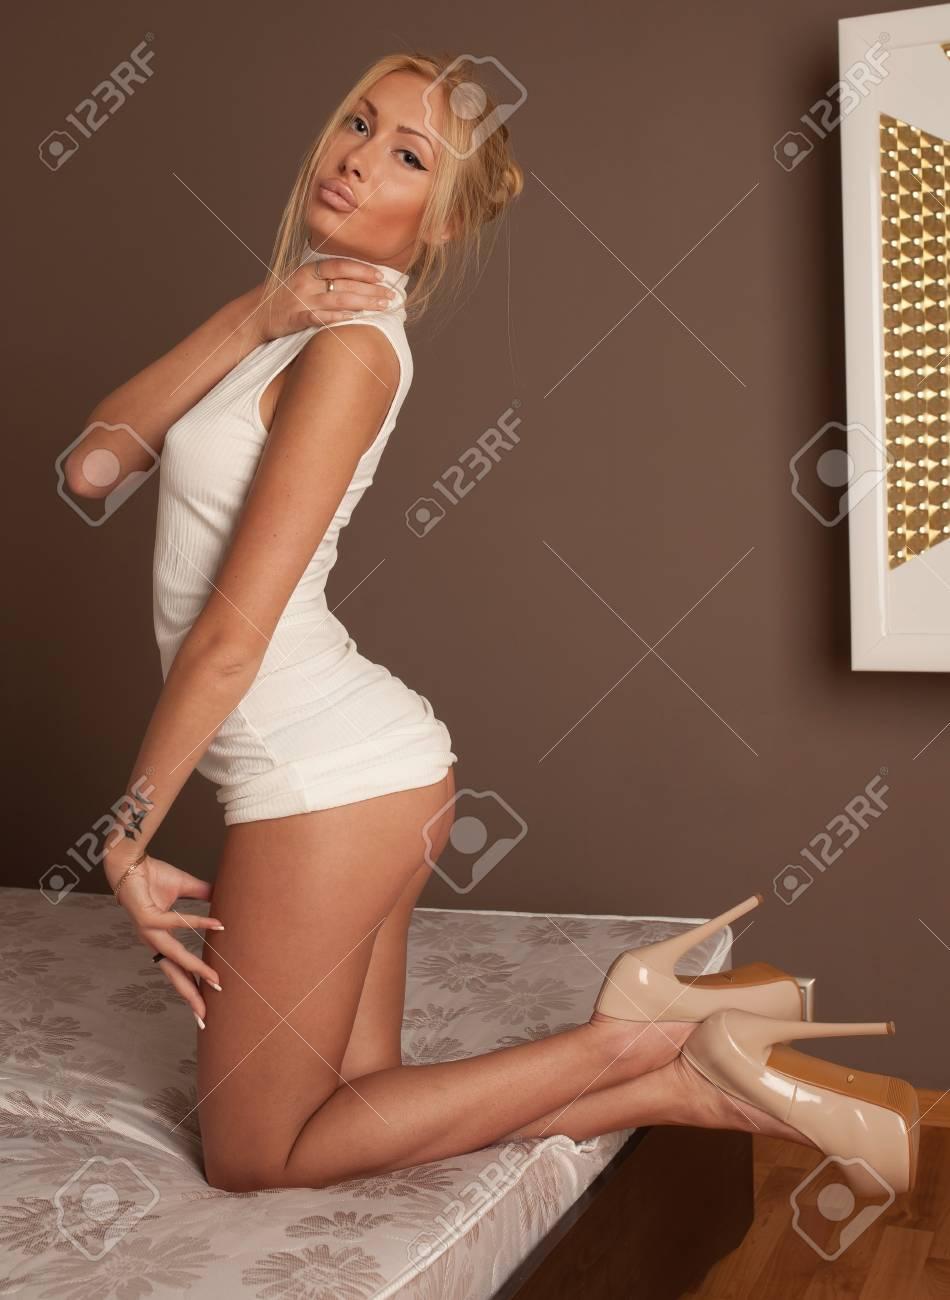 dimond kitty sex pics